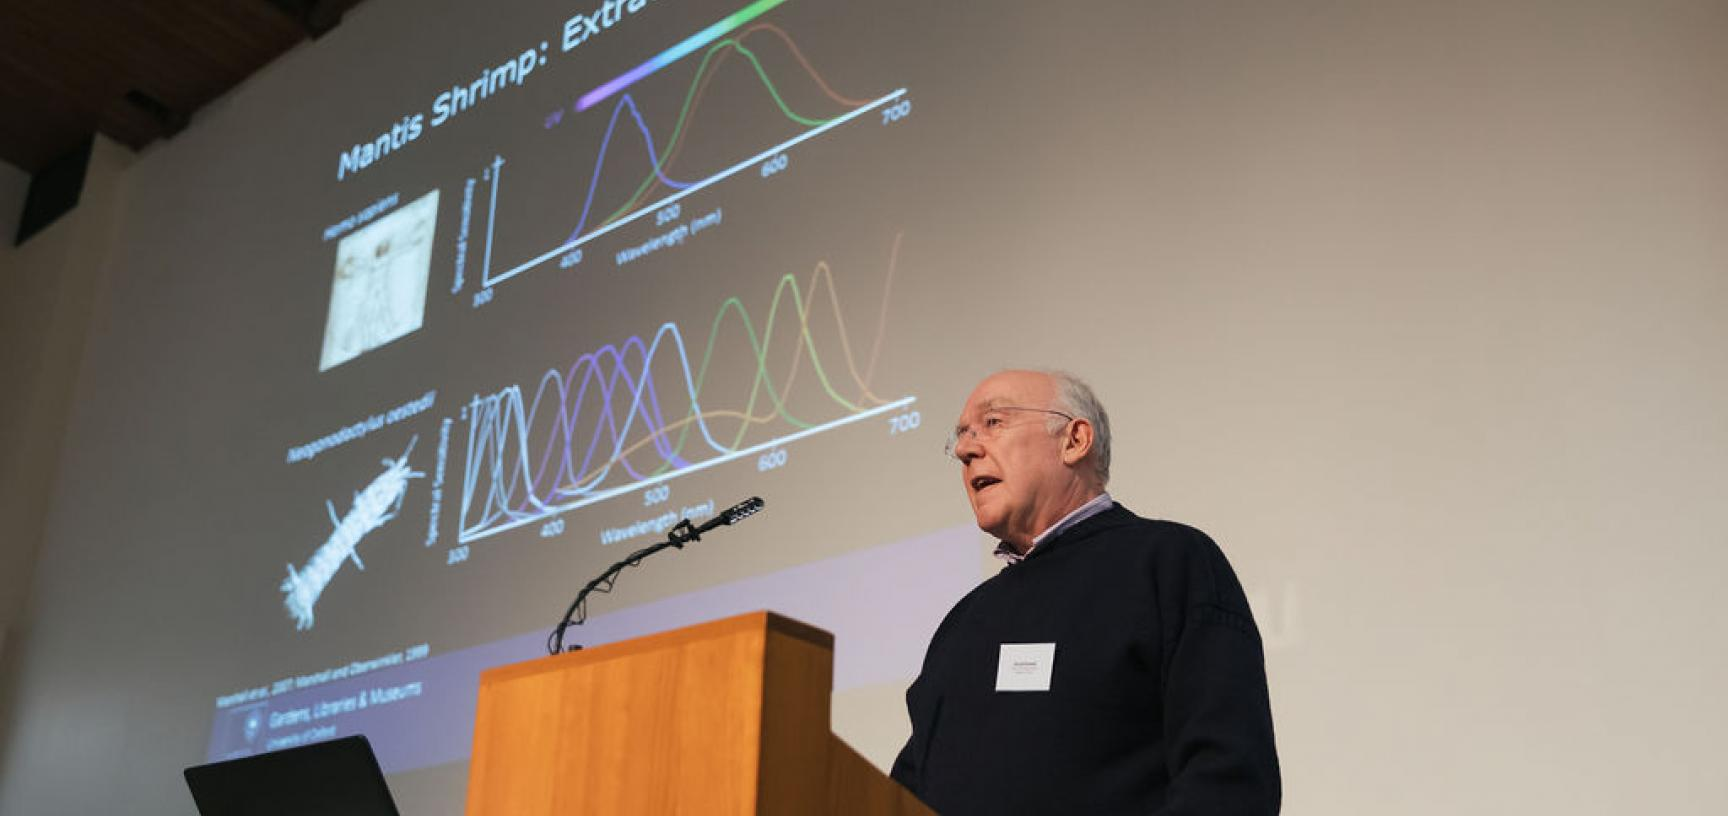 GLAM digital showcase: hyperspectral imaging talk